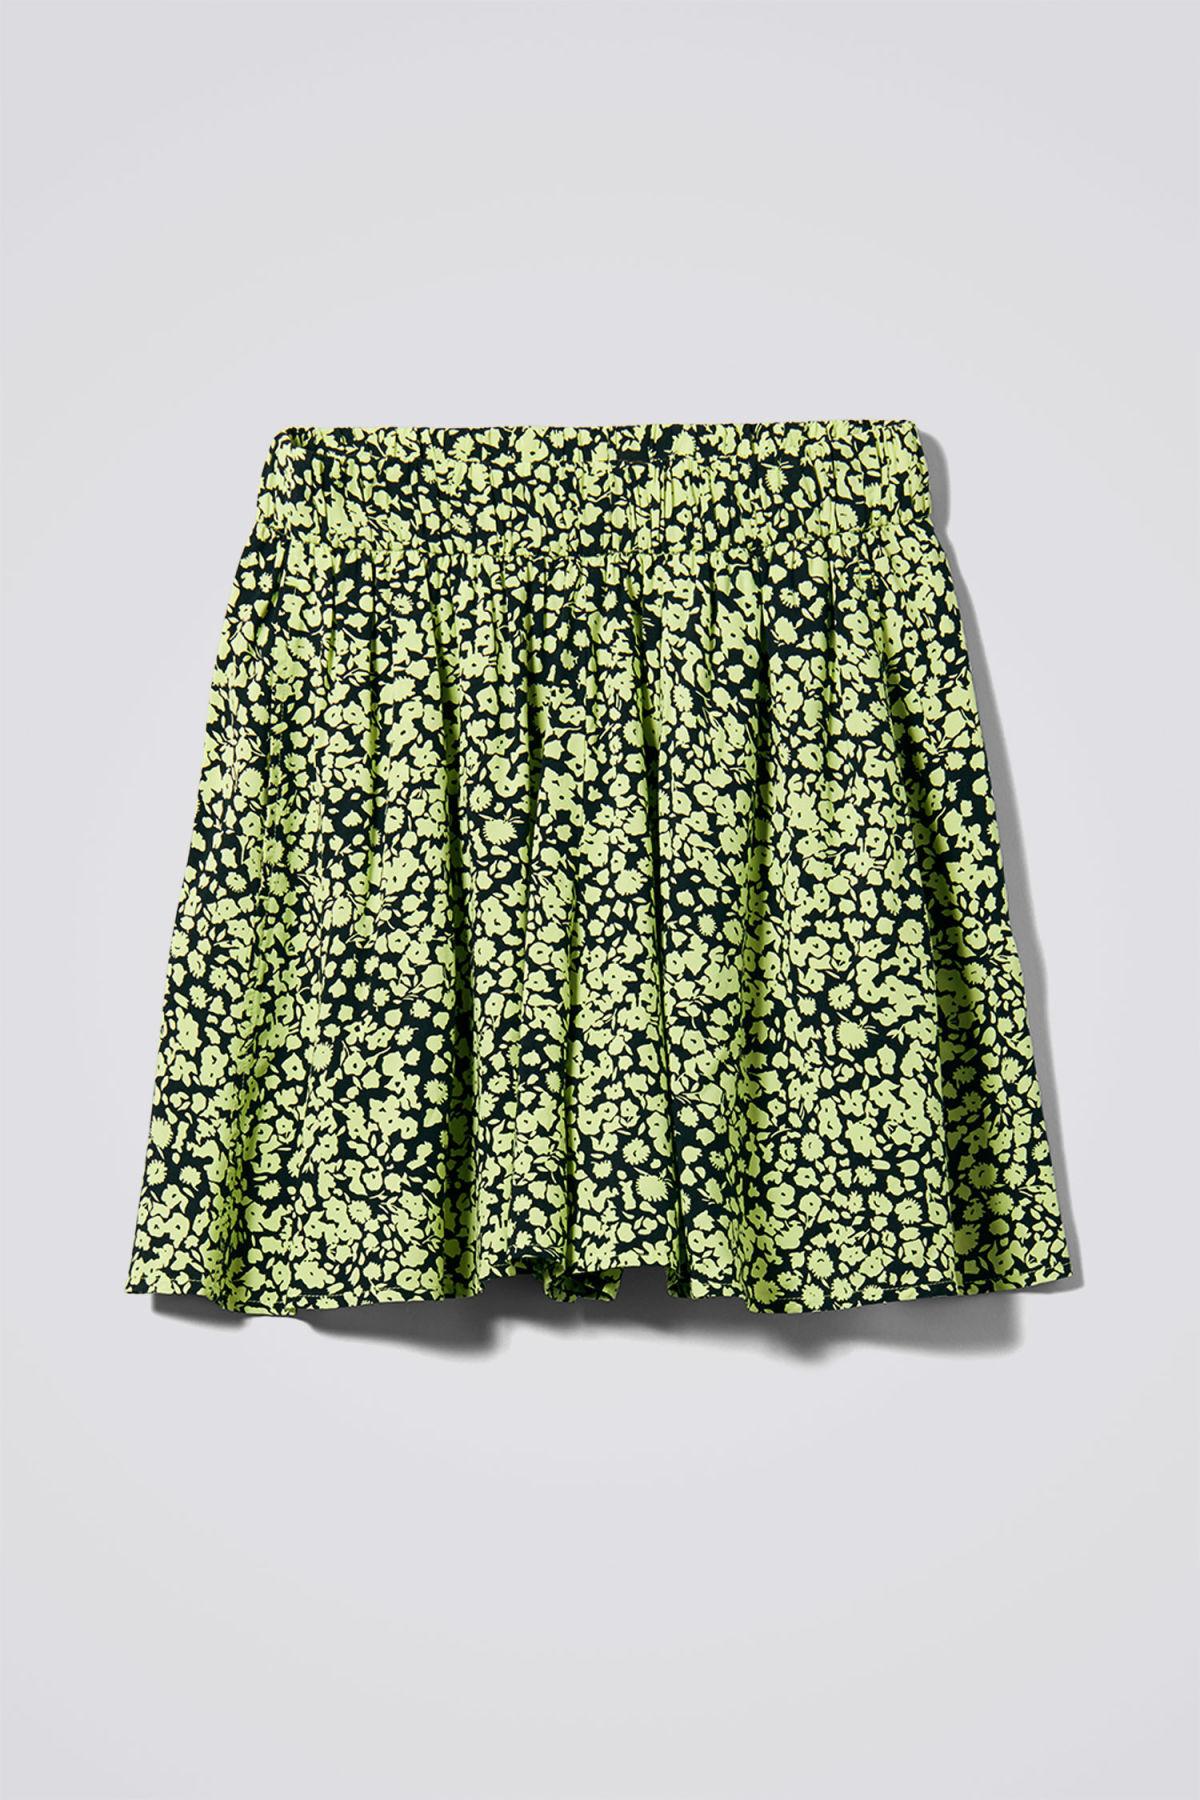 Image of Litz Shorts - Yellow-34